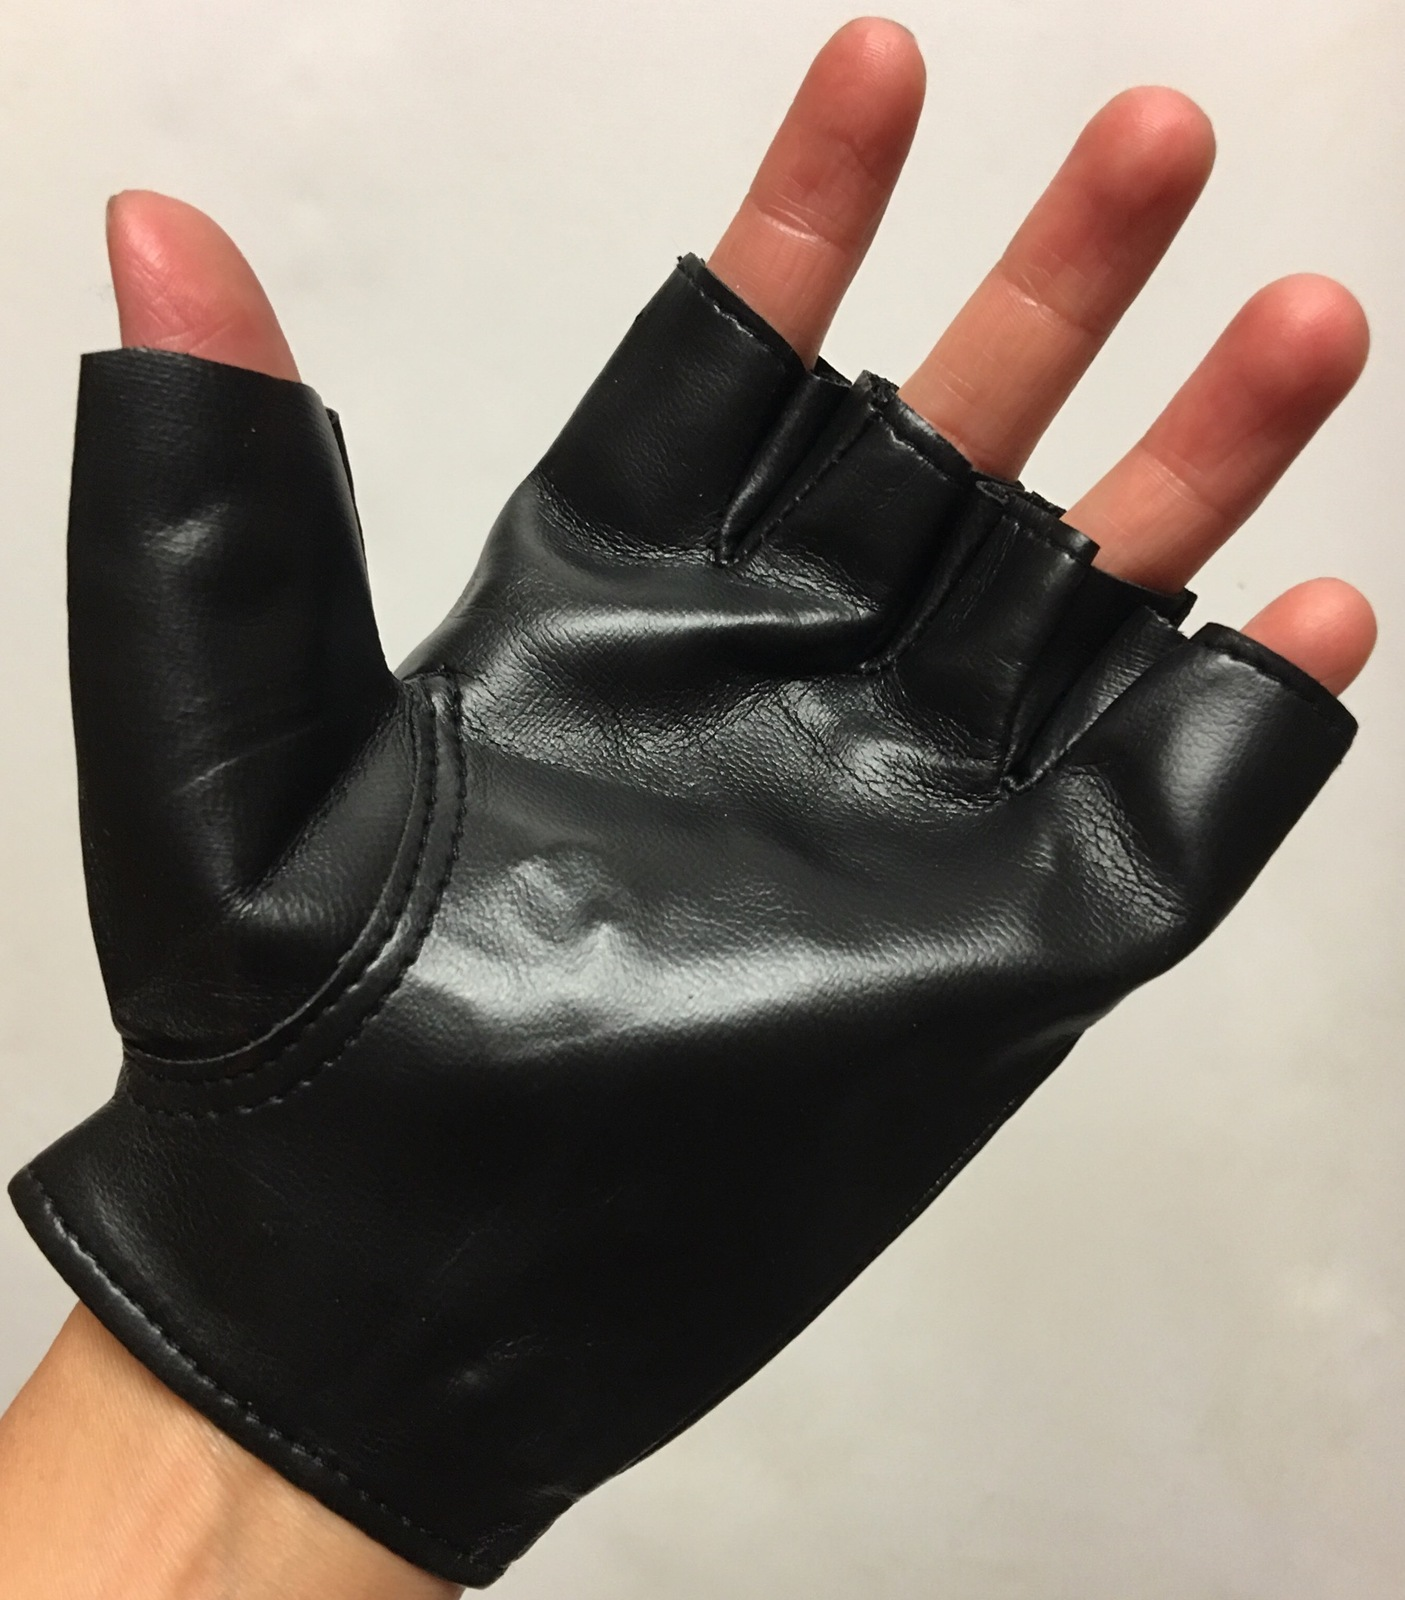 Urban Wear Ornate Studs Gloves